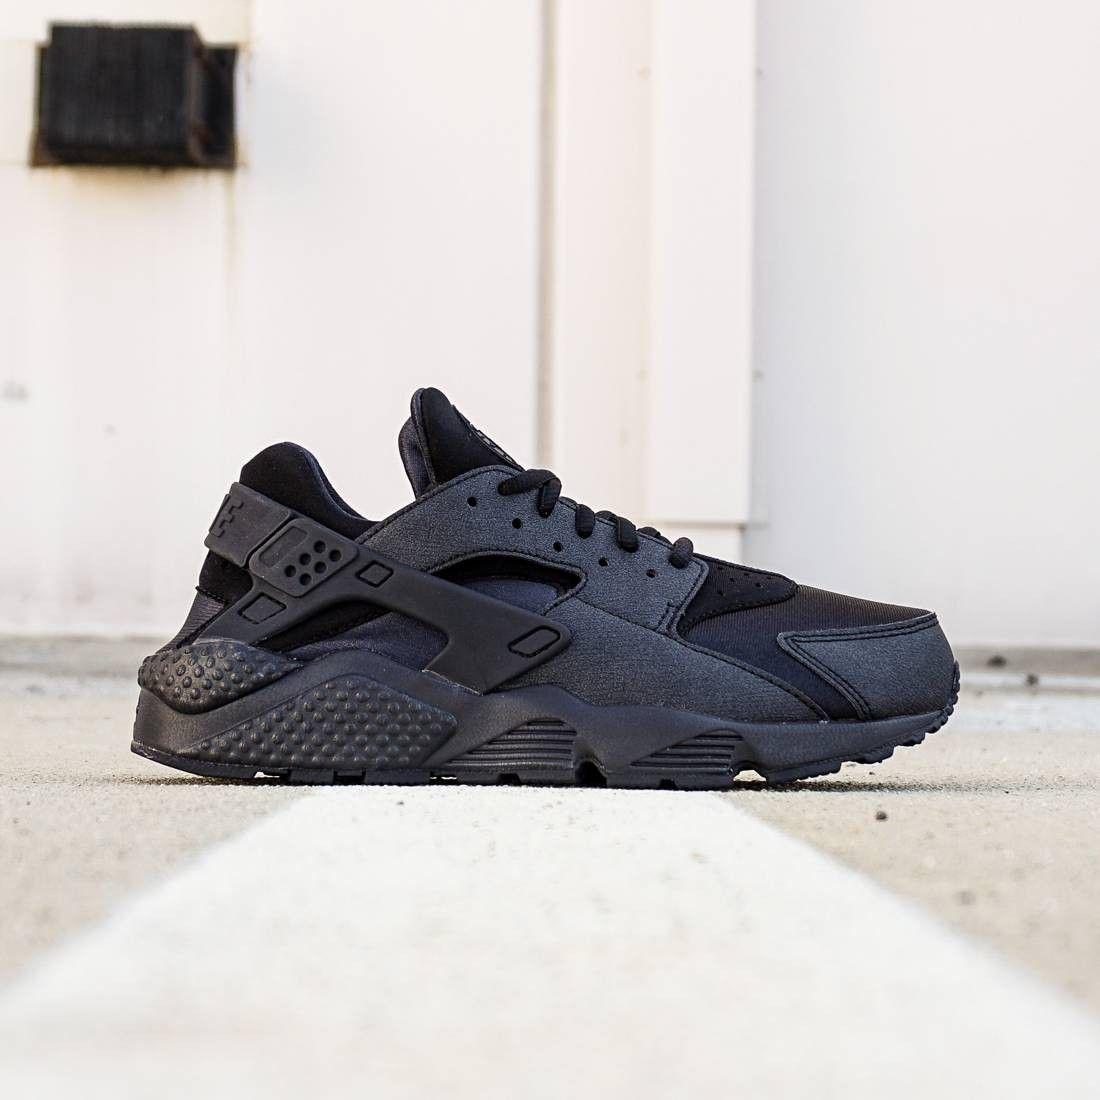 Nike Women Air Huarache Run Black Black In 2021 Huaraches White Nike Shoes Nike Shoes Tumblr